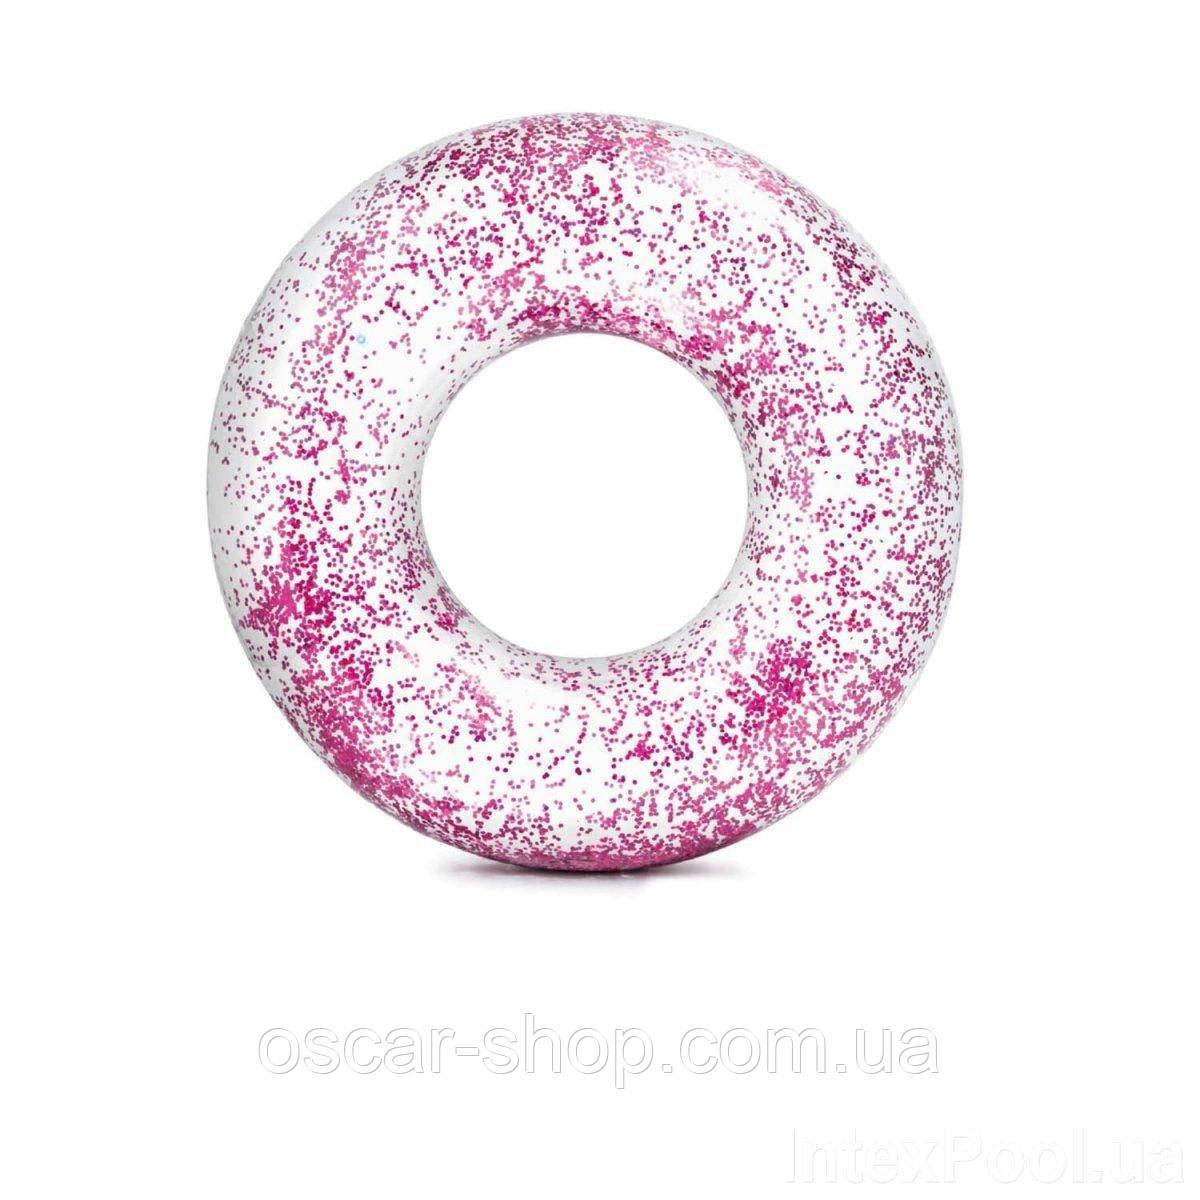 Intex надувний круг «Рожевий блиск», 119 см, золотий